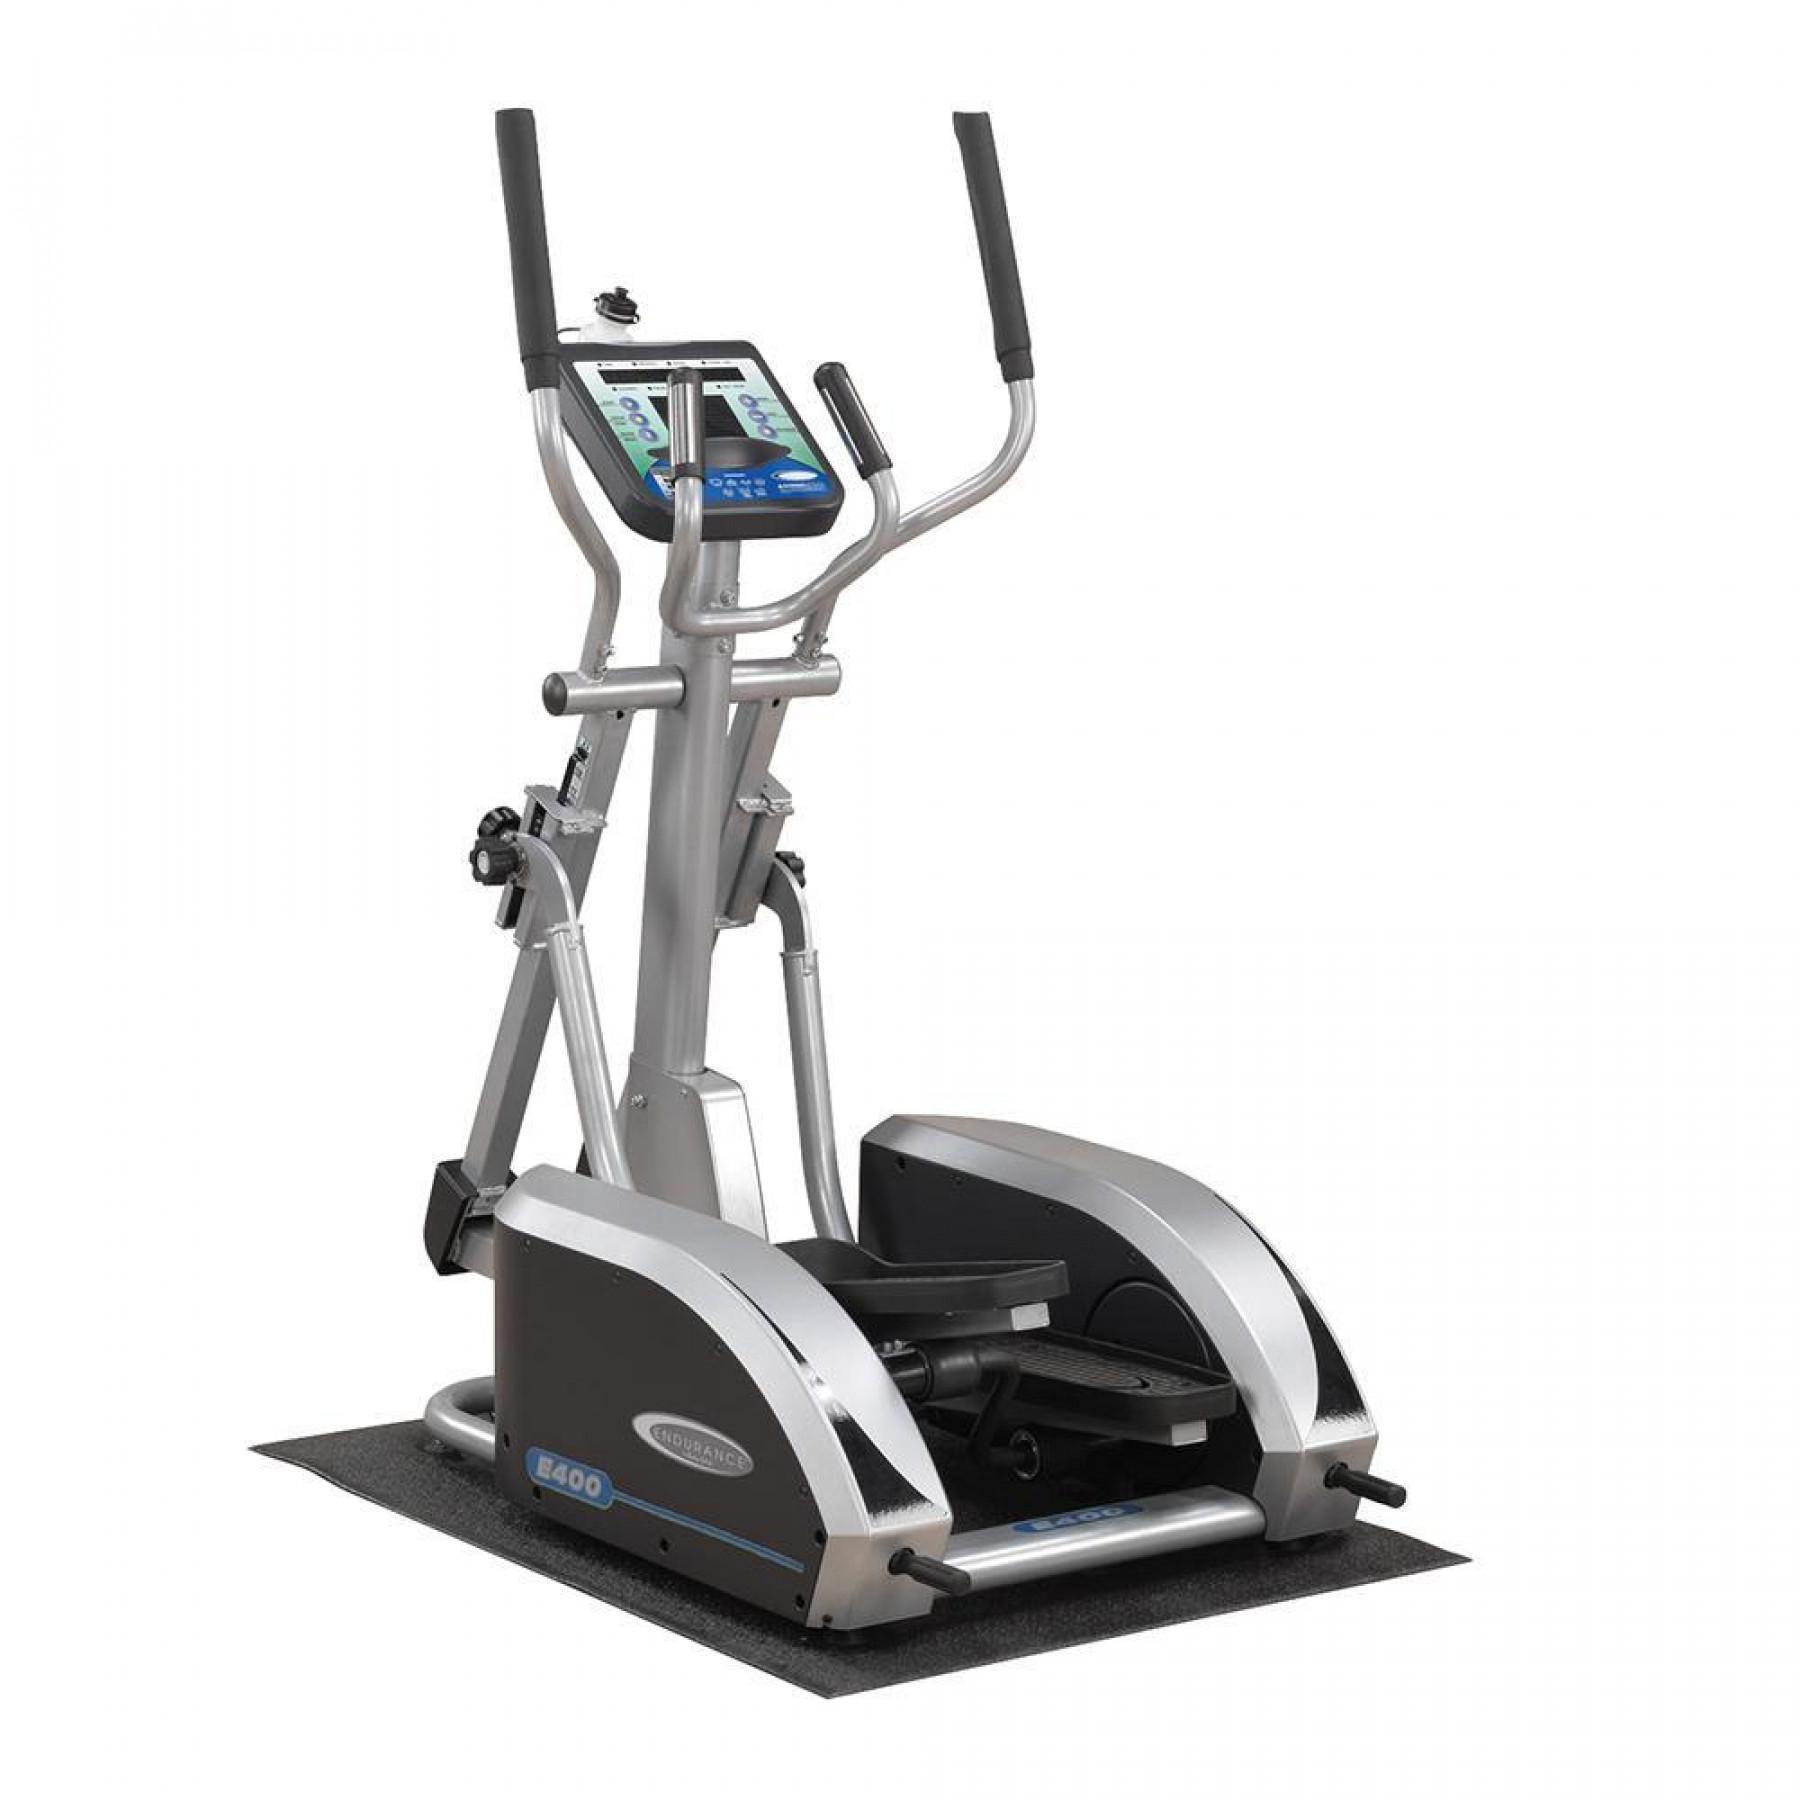 Elliptical trainer Endurance Trainer